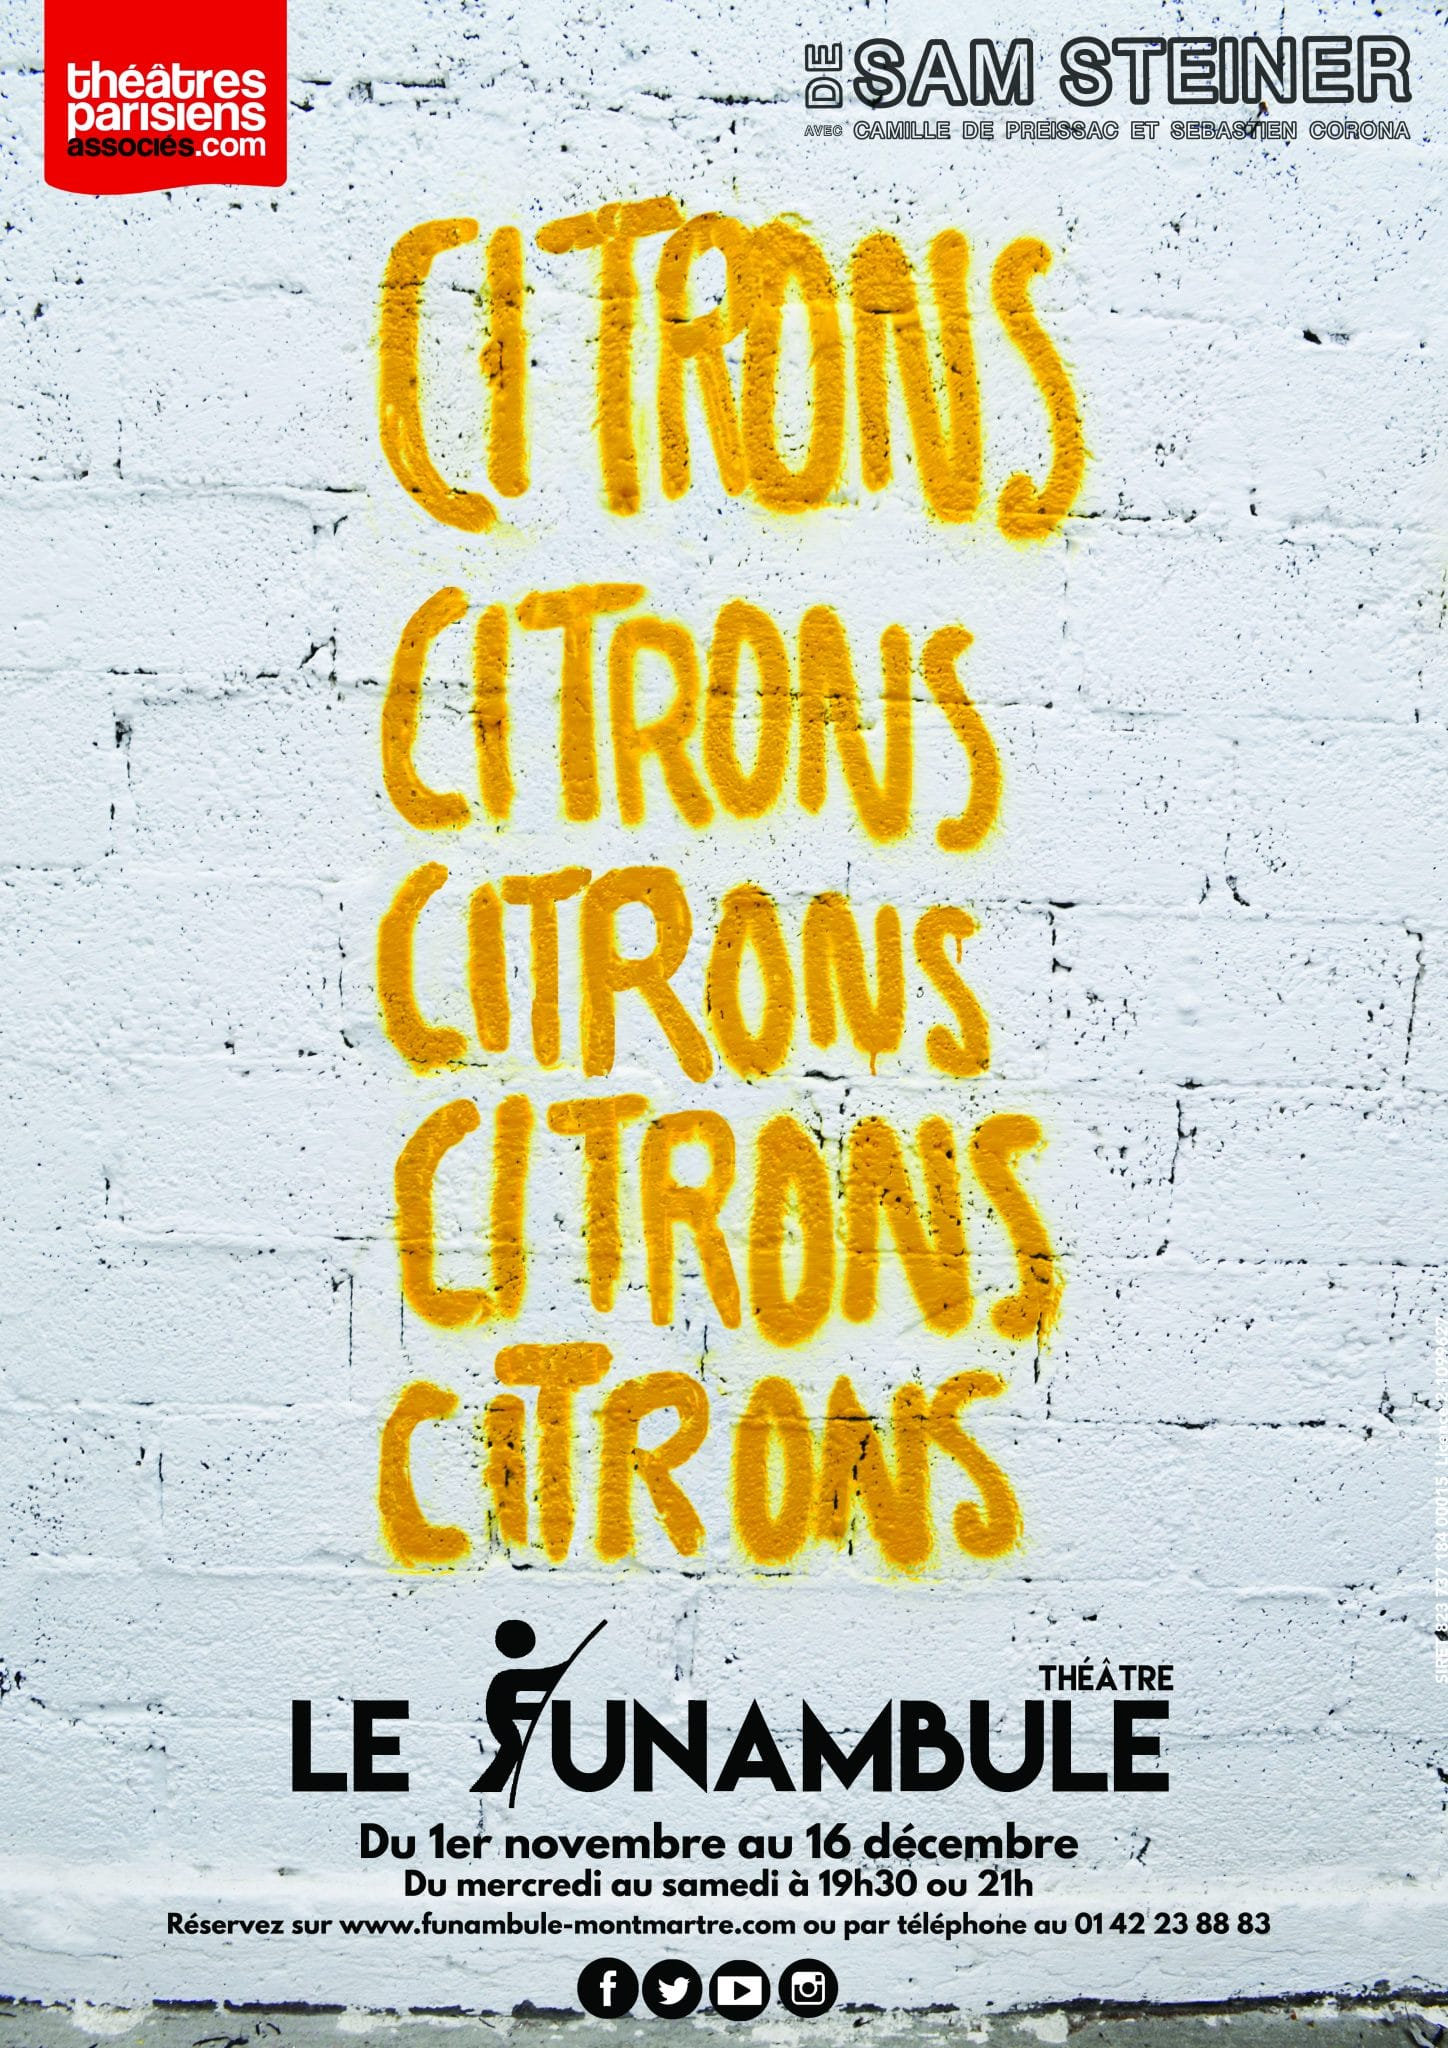 Citrons Citrons Citrons Citrons Citrons Sébastien Corona et Richard Studer affiche